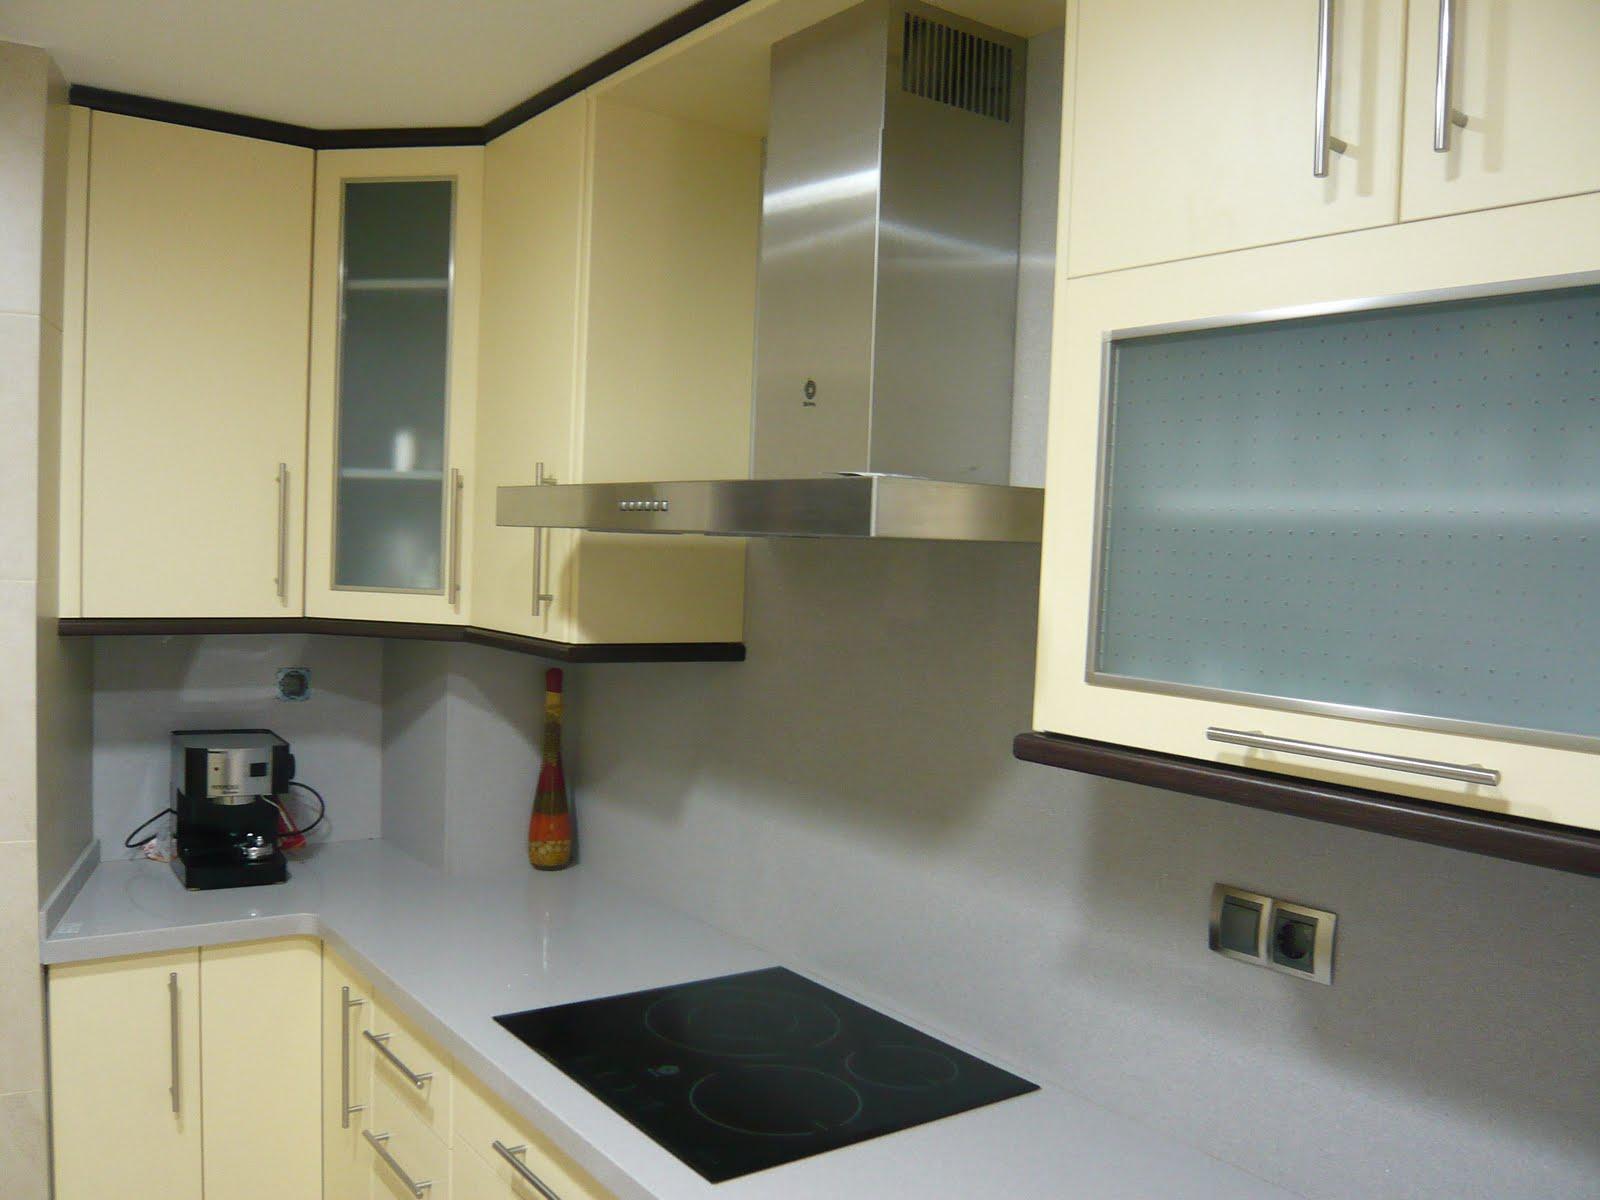 Reuscuina cocina de formica en 2 colores - Cocina de formica ...